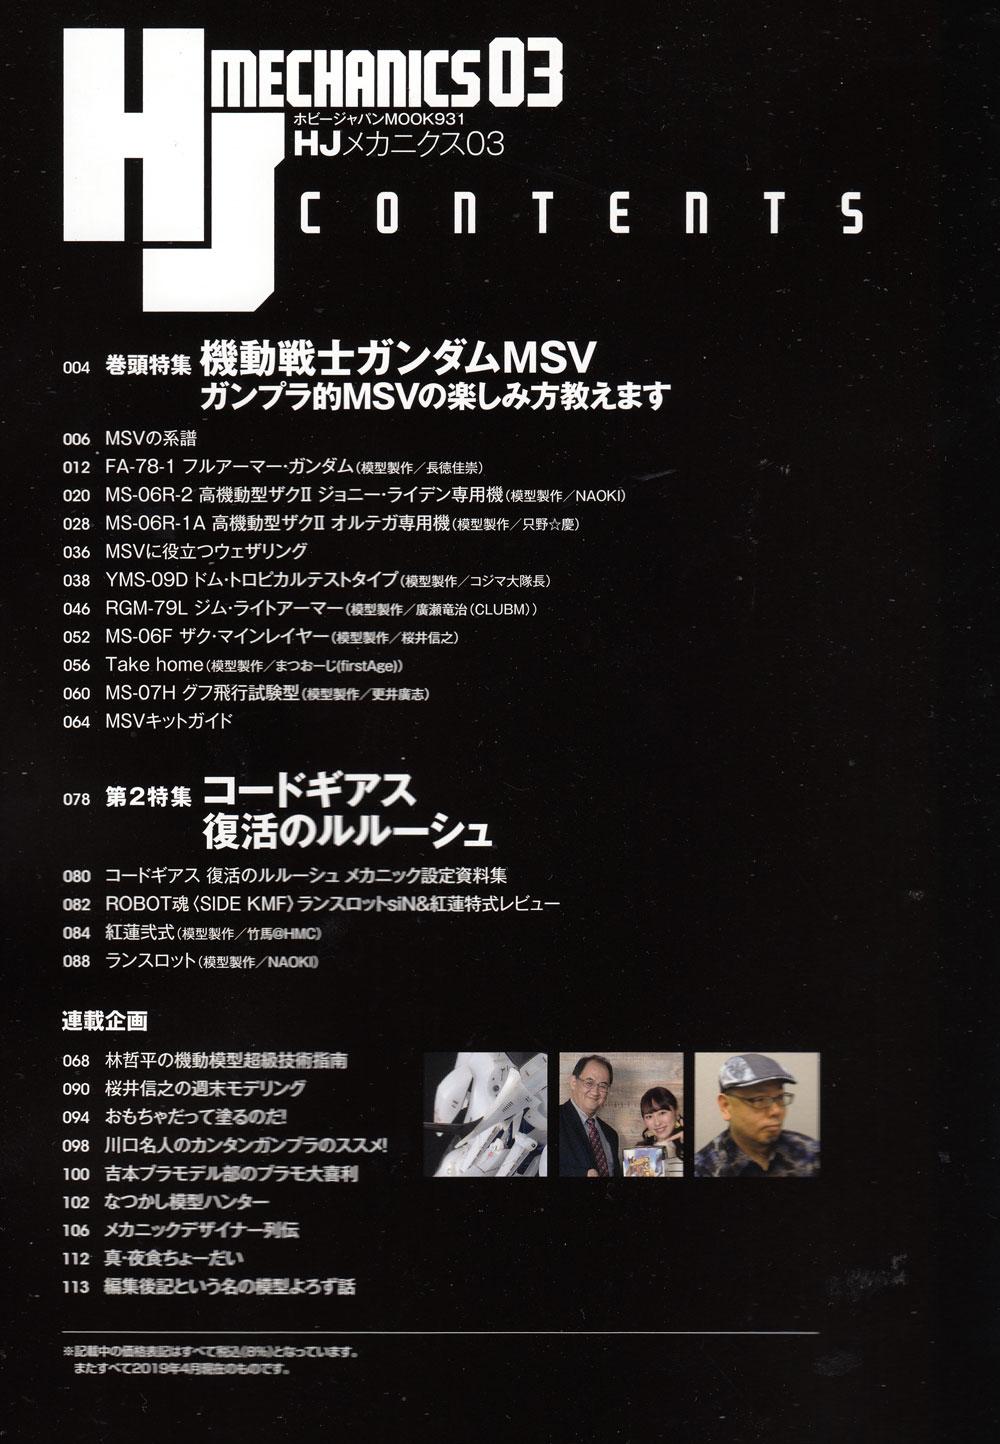 HJ メカニクス 03本 (ホビージャパンHJメカニクスNo.68150-31)商品画像_1